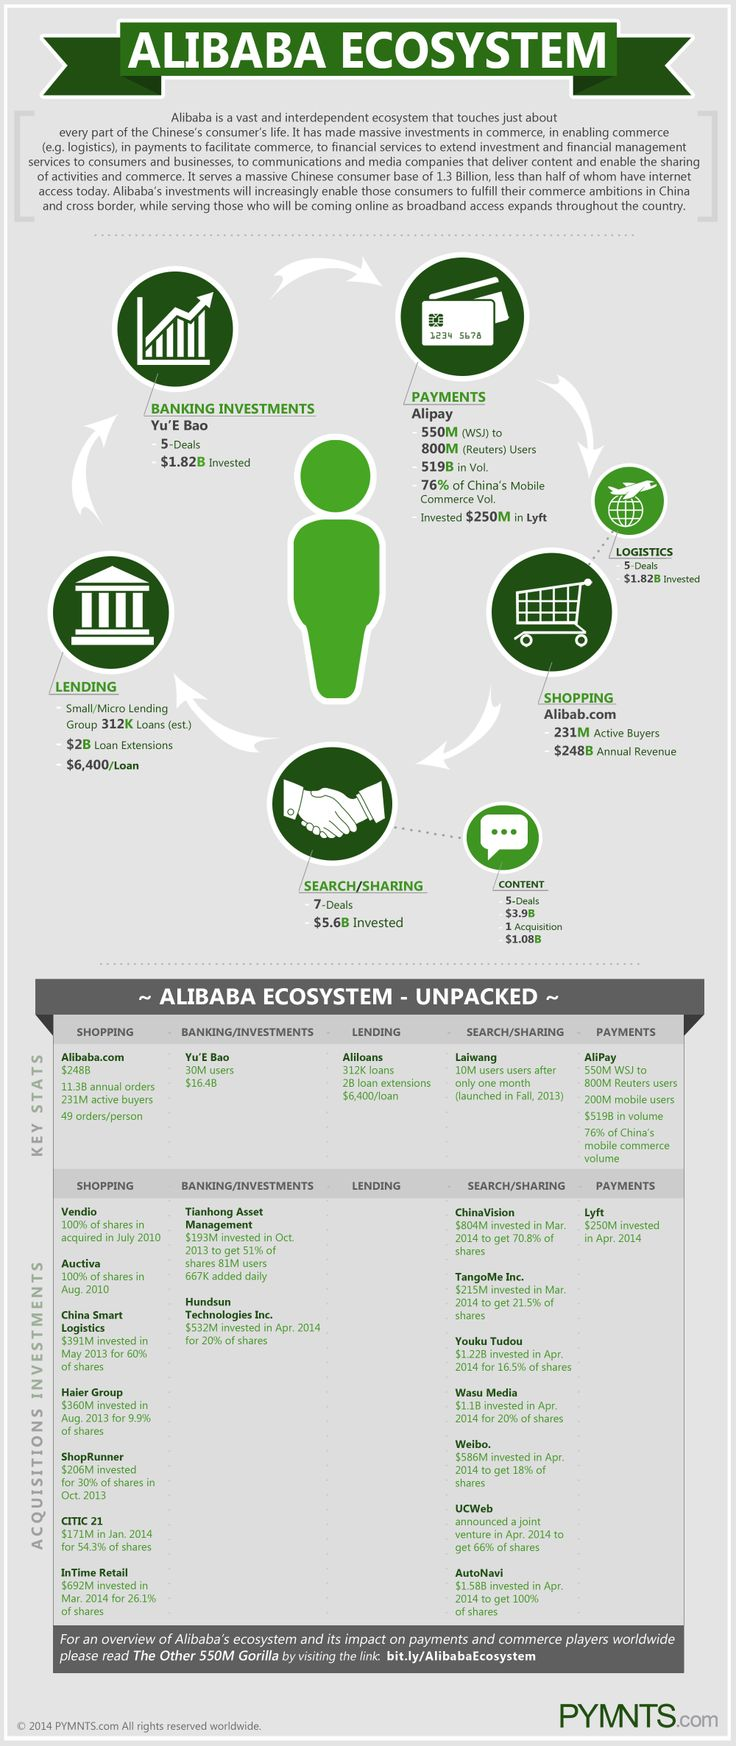 Crossborder Ecommerce Get To Know Alibaba #china #ecommerce